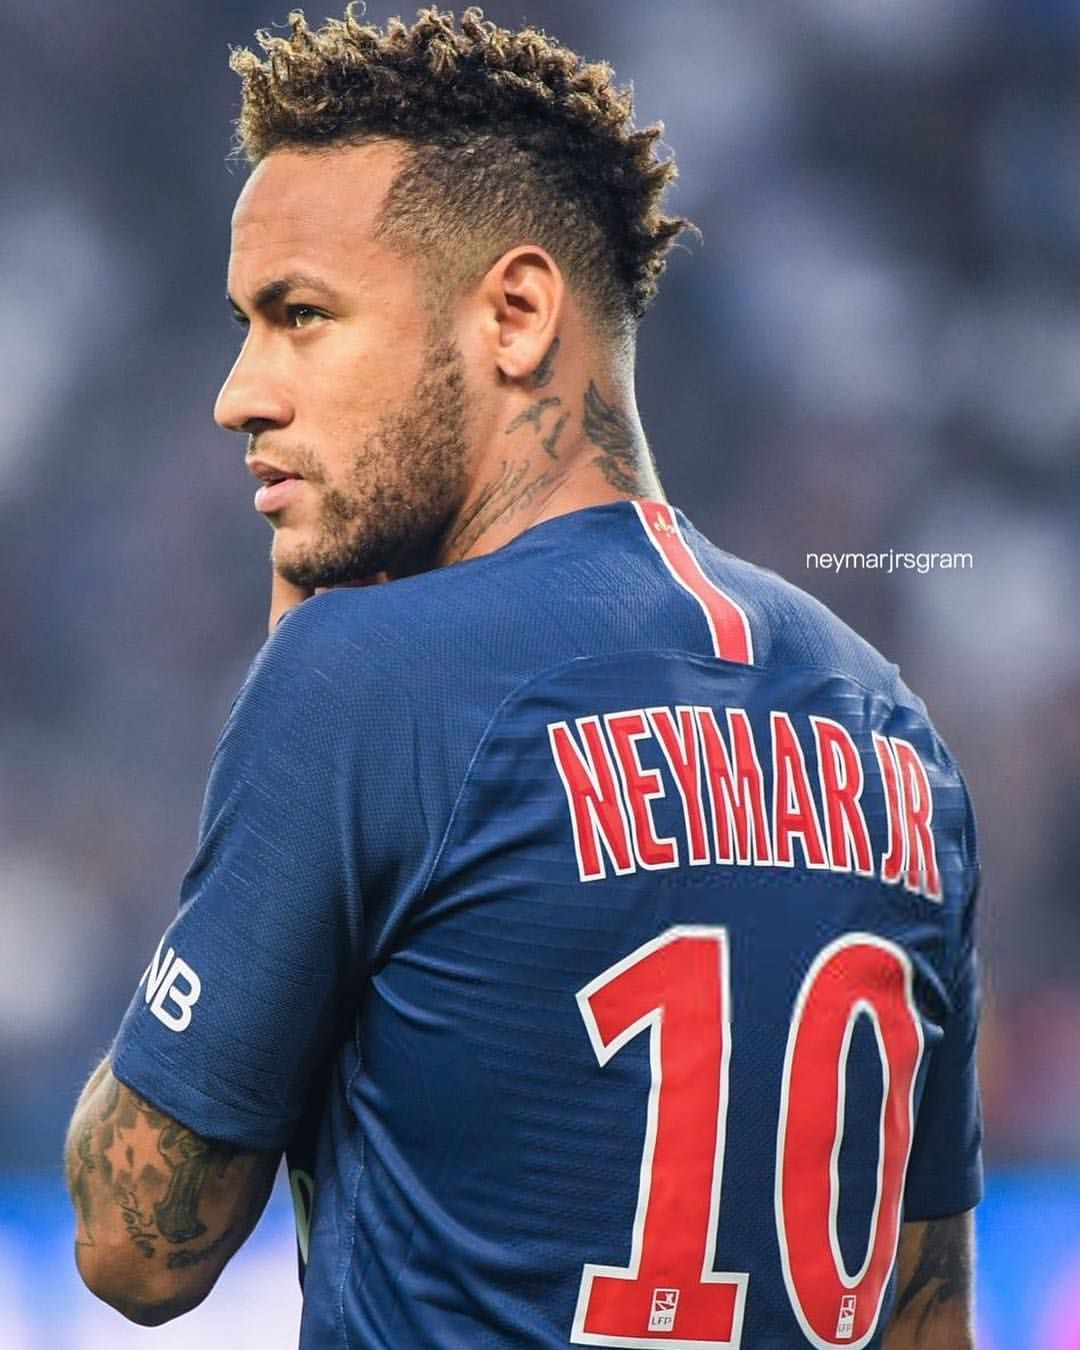 Pin De Rodriguezadaviar En Neymar JR